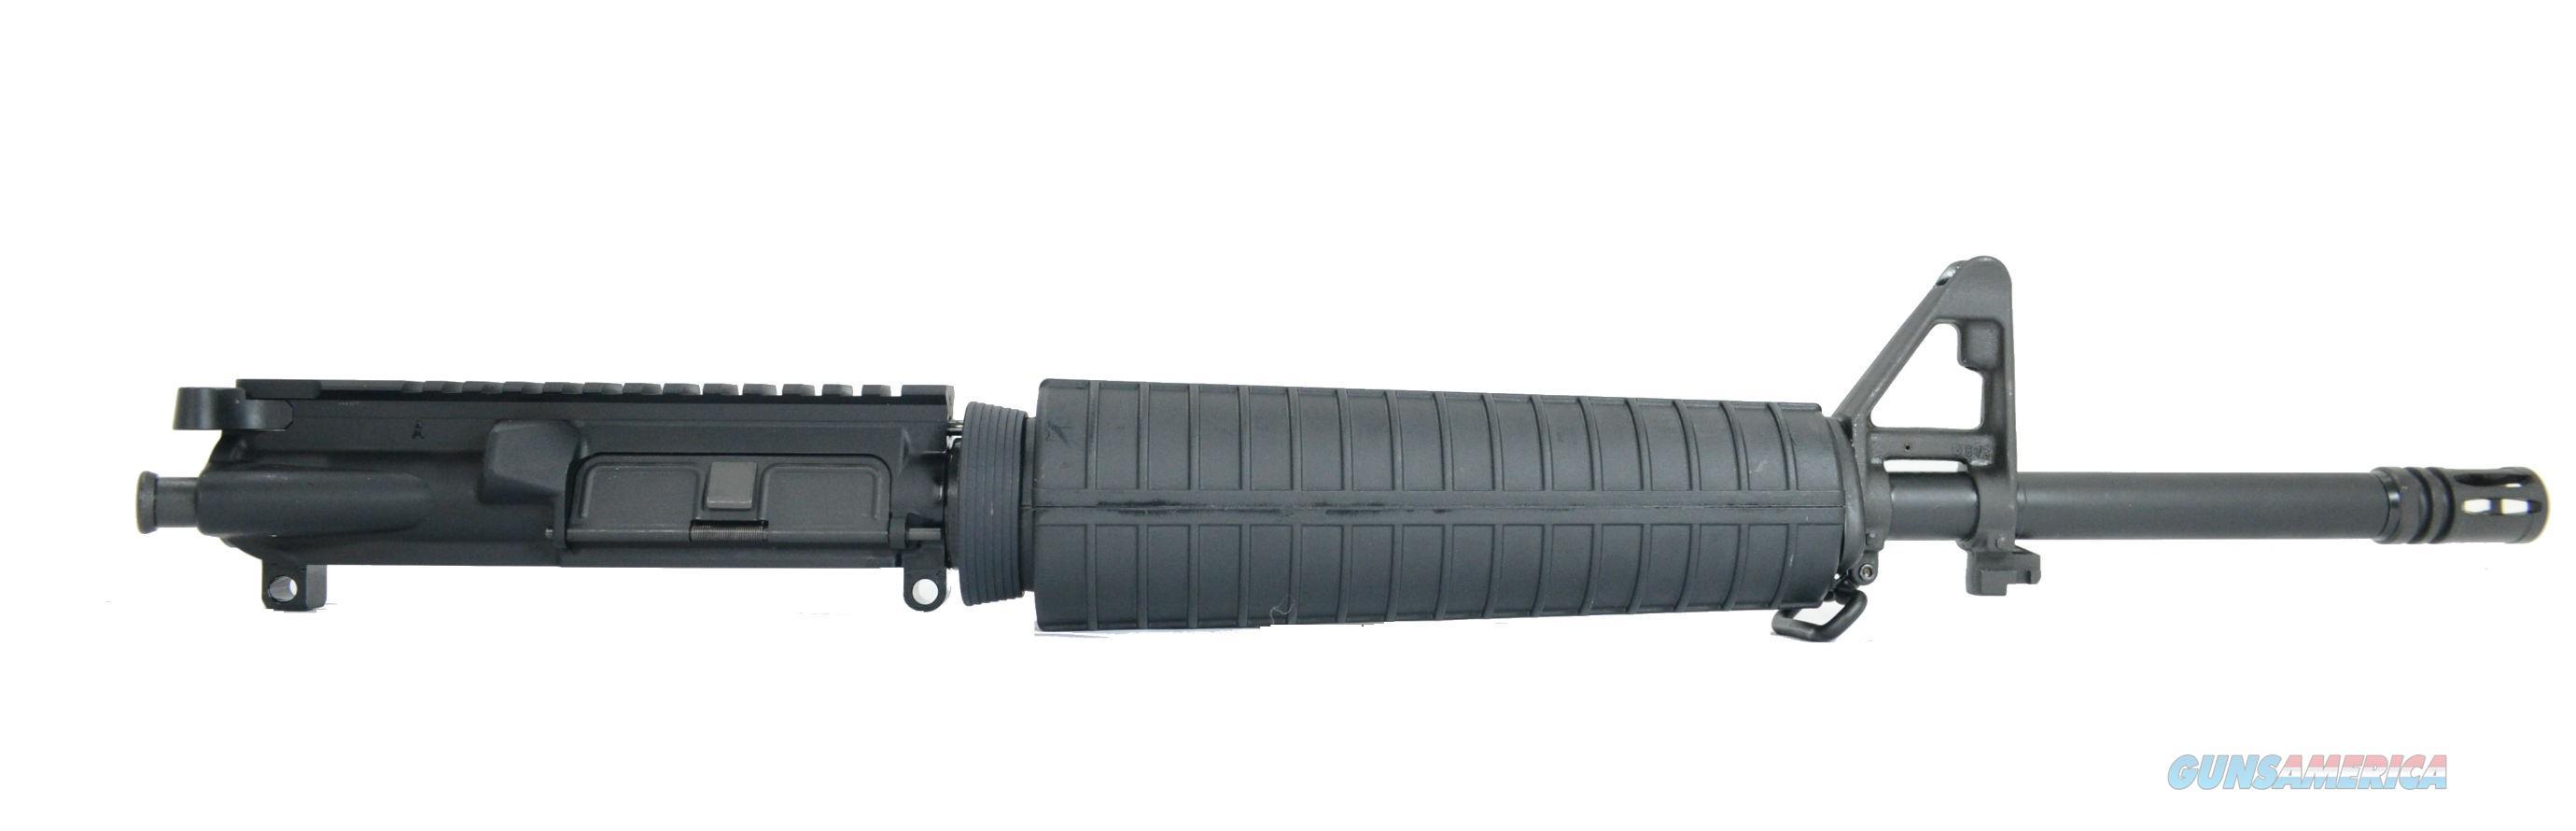 Forged 7075 T6 A-3 Upper Receiver   Non-Guns > Gun Parts > M16-AR15 > Upper Only